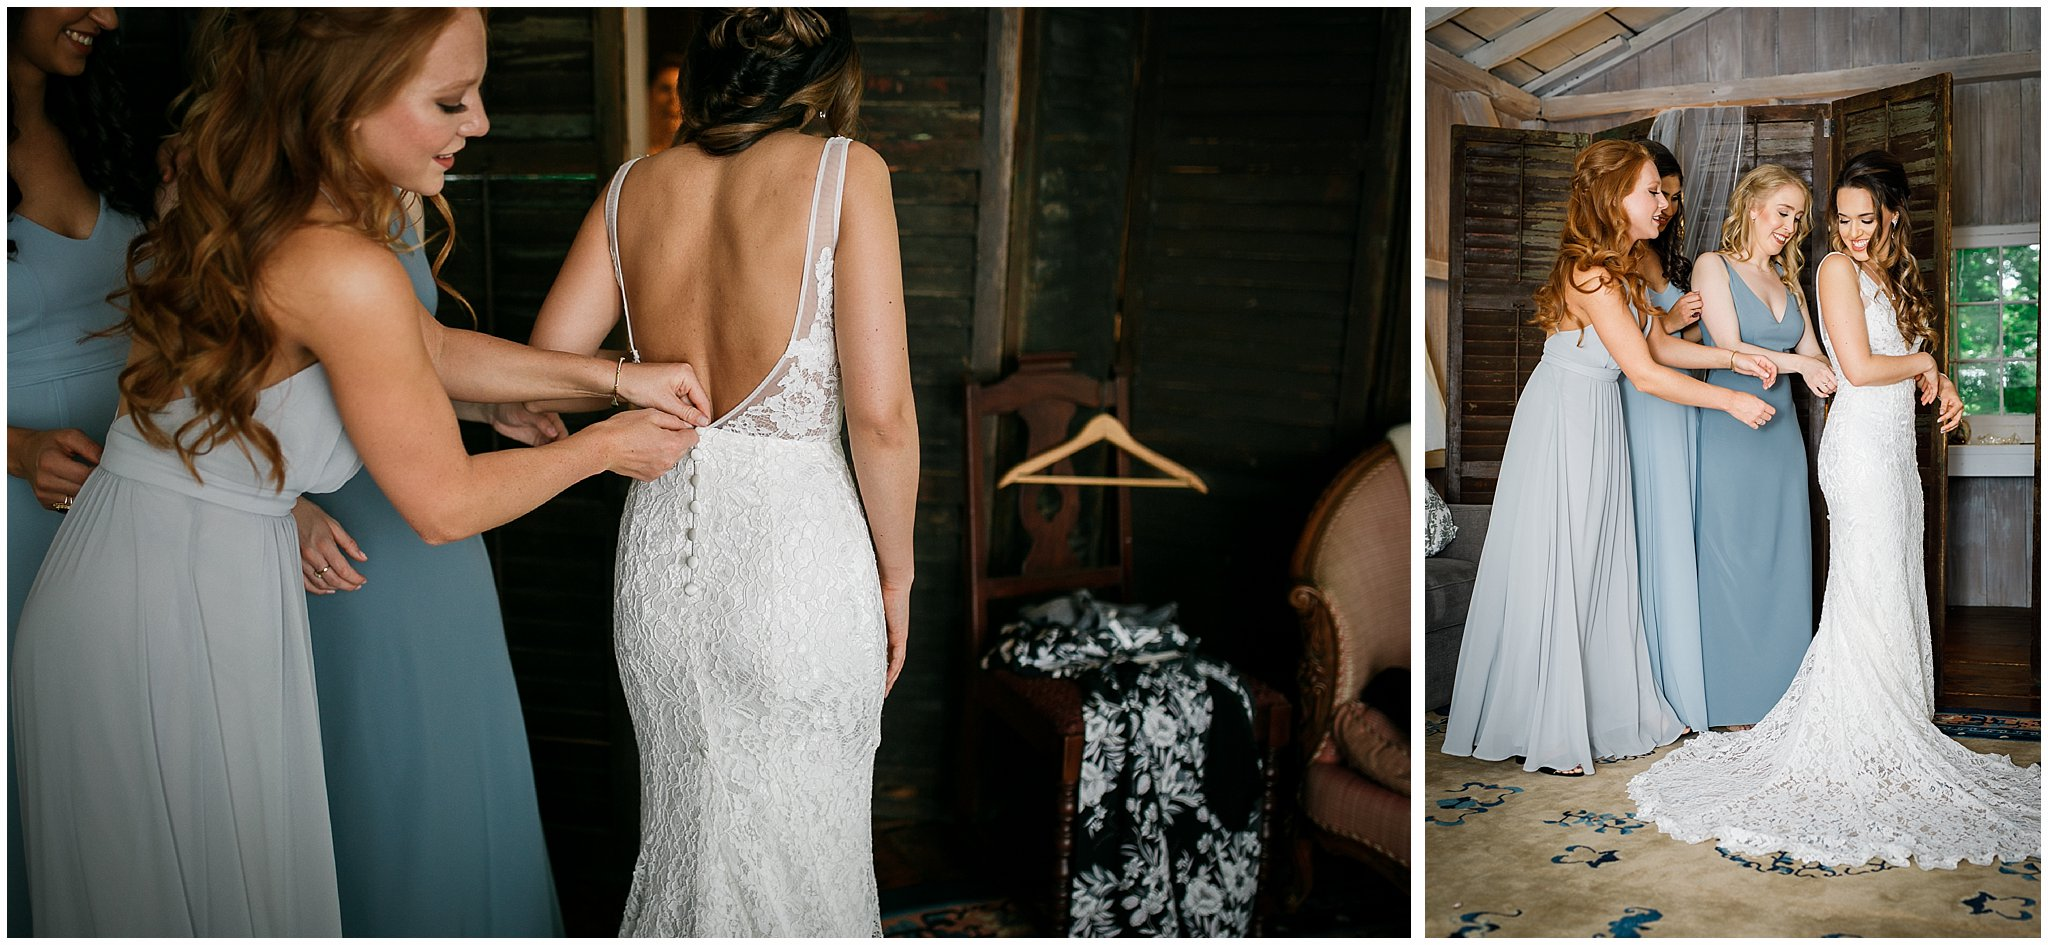 Hudson Valley Weddings at the Hill Hudson New York Wedding Photographer28.jpg